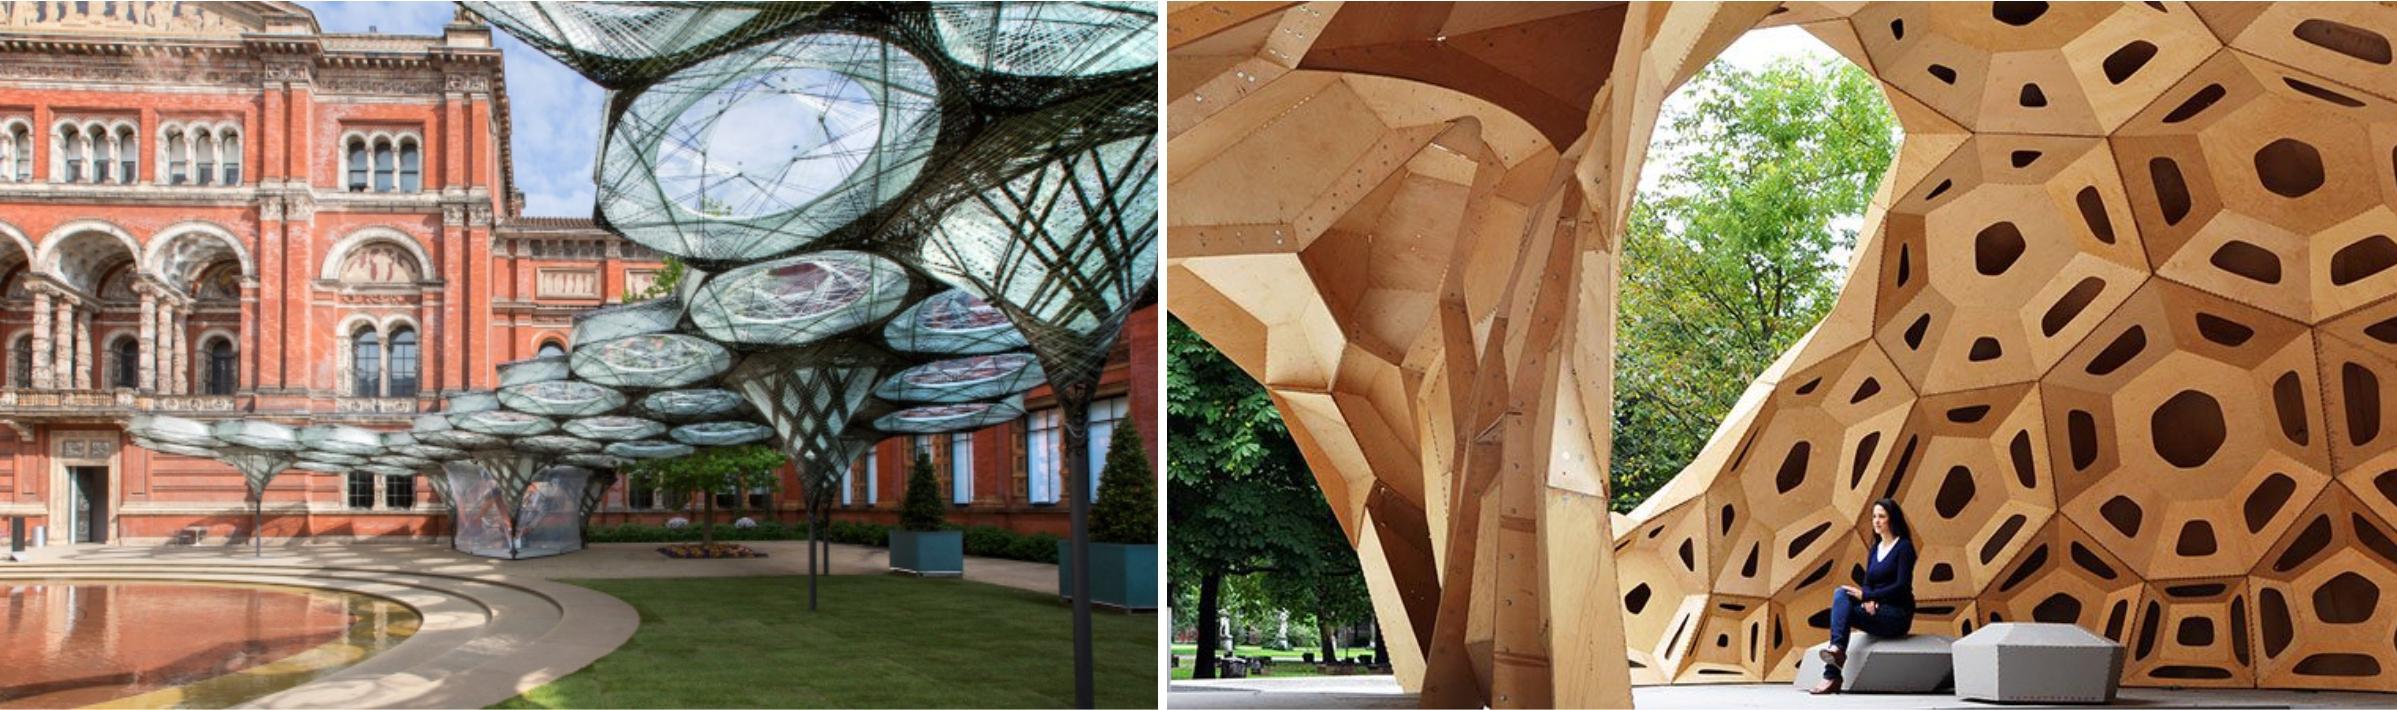 Павильон Elytra Filament, Лондон, Аким Менгес. ICD/ITKE Research Pavilion, Штутгарт